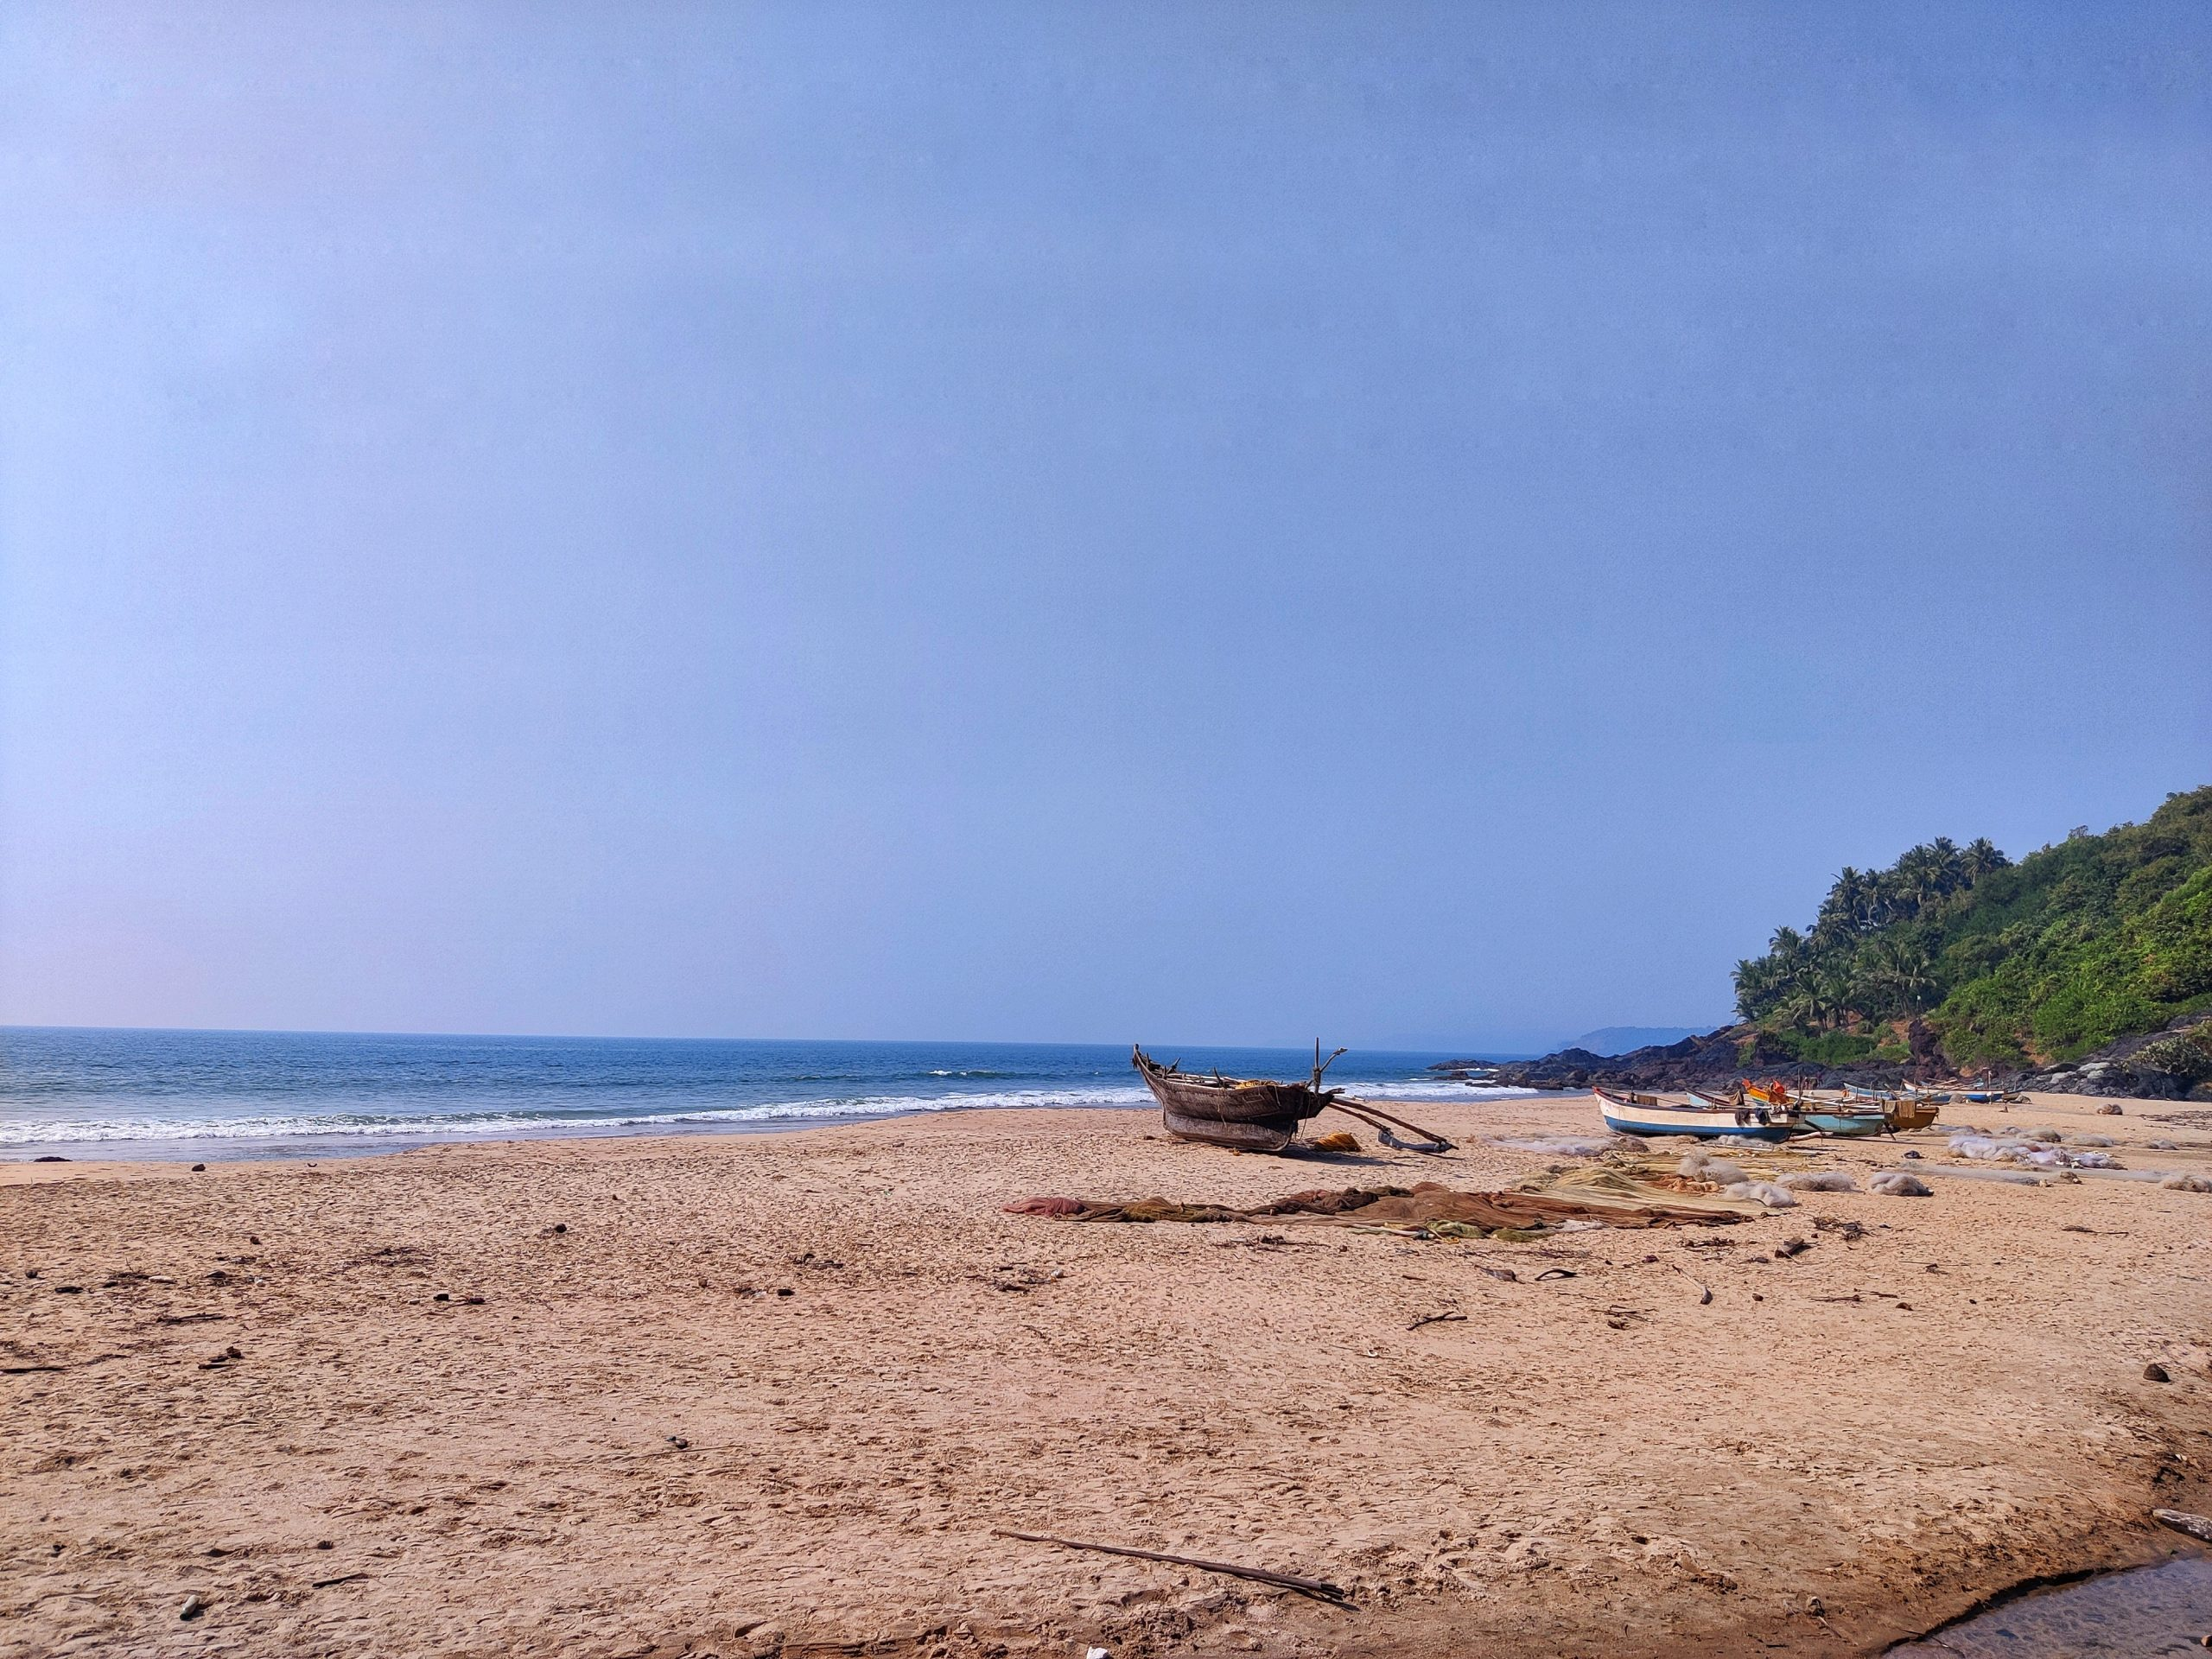 Kondura beach in Mumbai